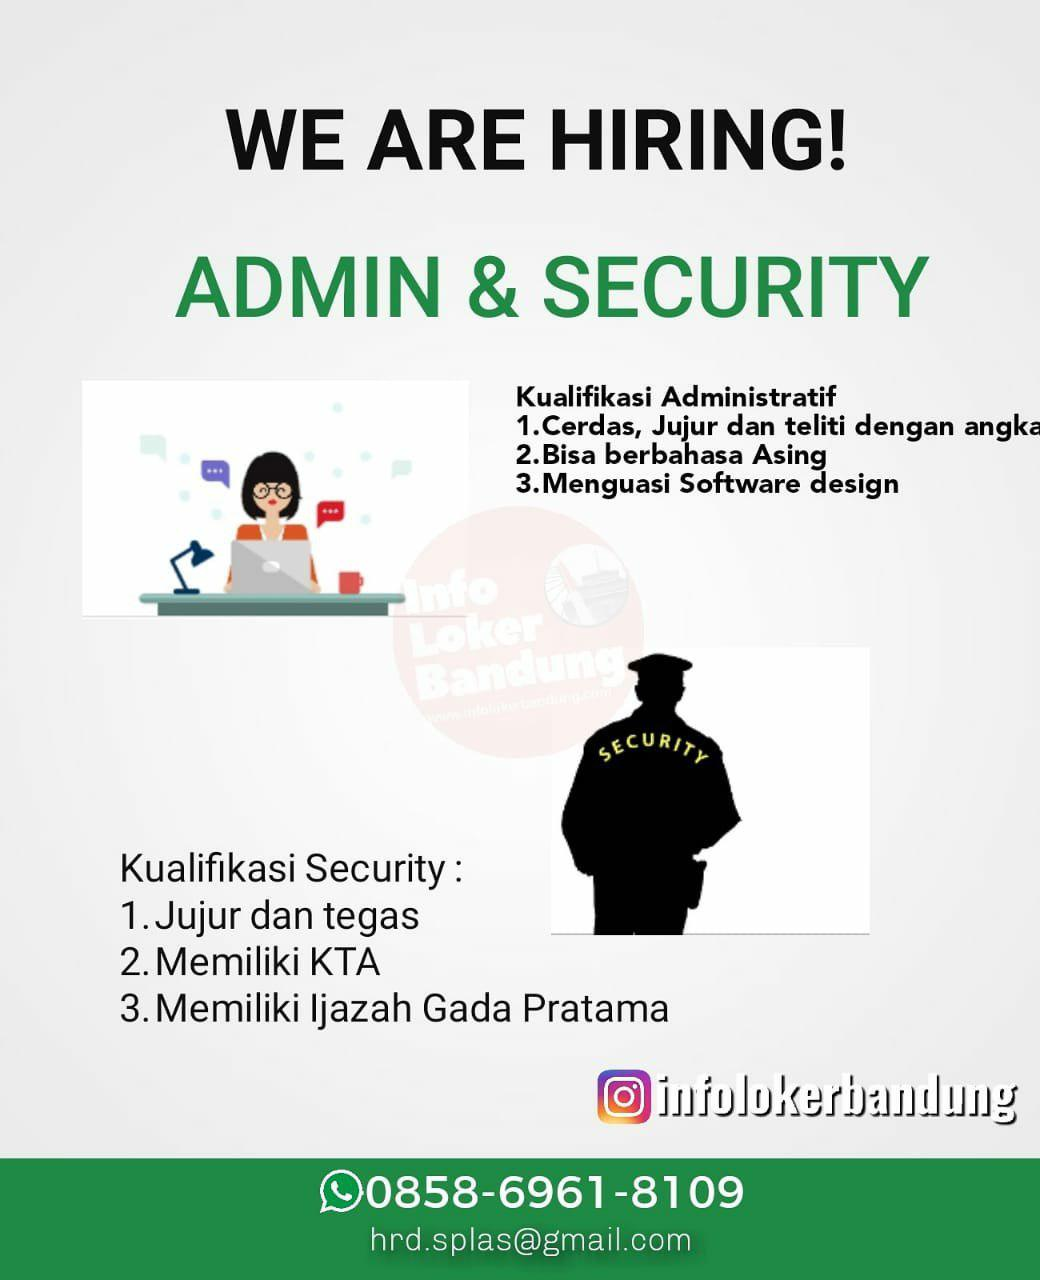 Lowongan Kerja Admin & Security Perusahaan Manufaktur Plastik Bandung September 2019